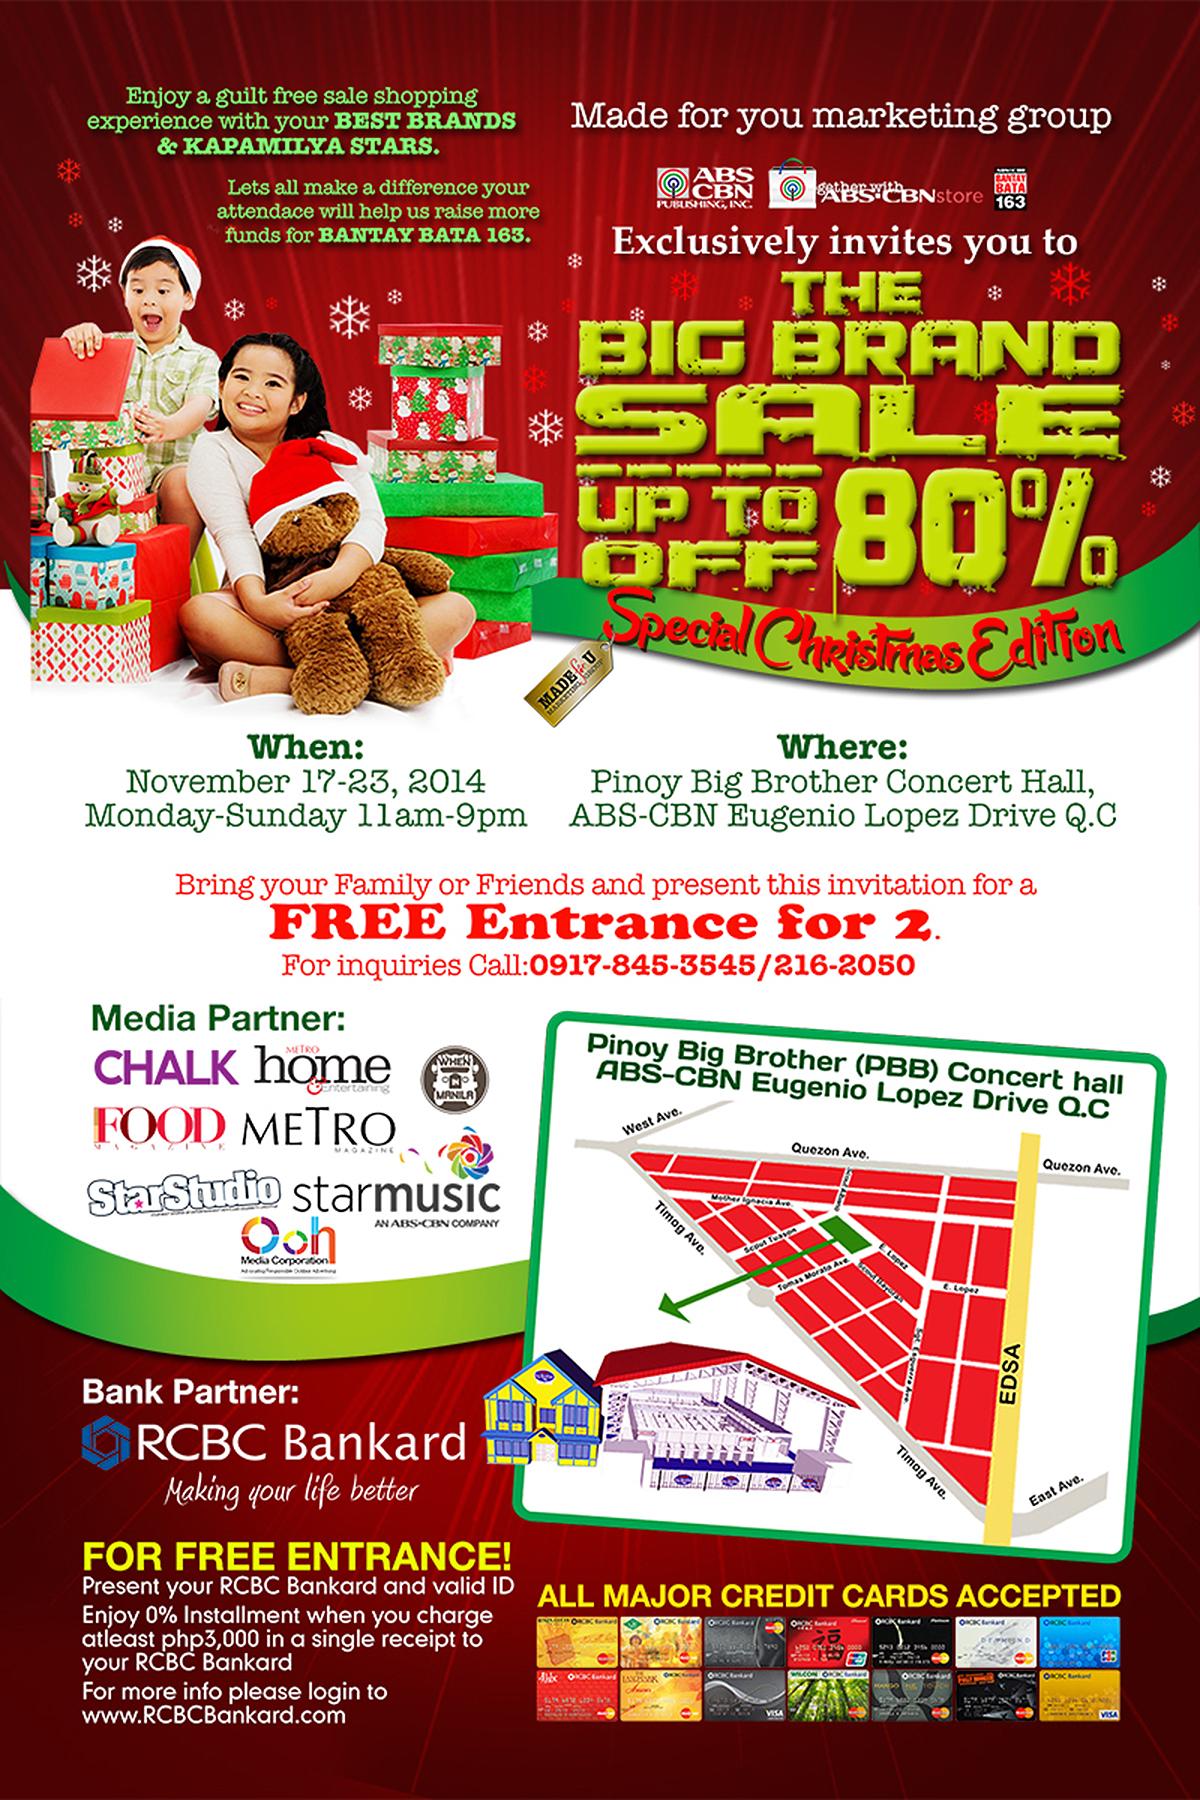 Trice Nagusara Big Brand Sale Special Christmas Edition 2014 04